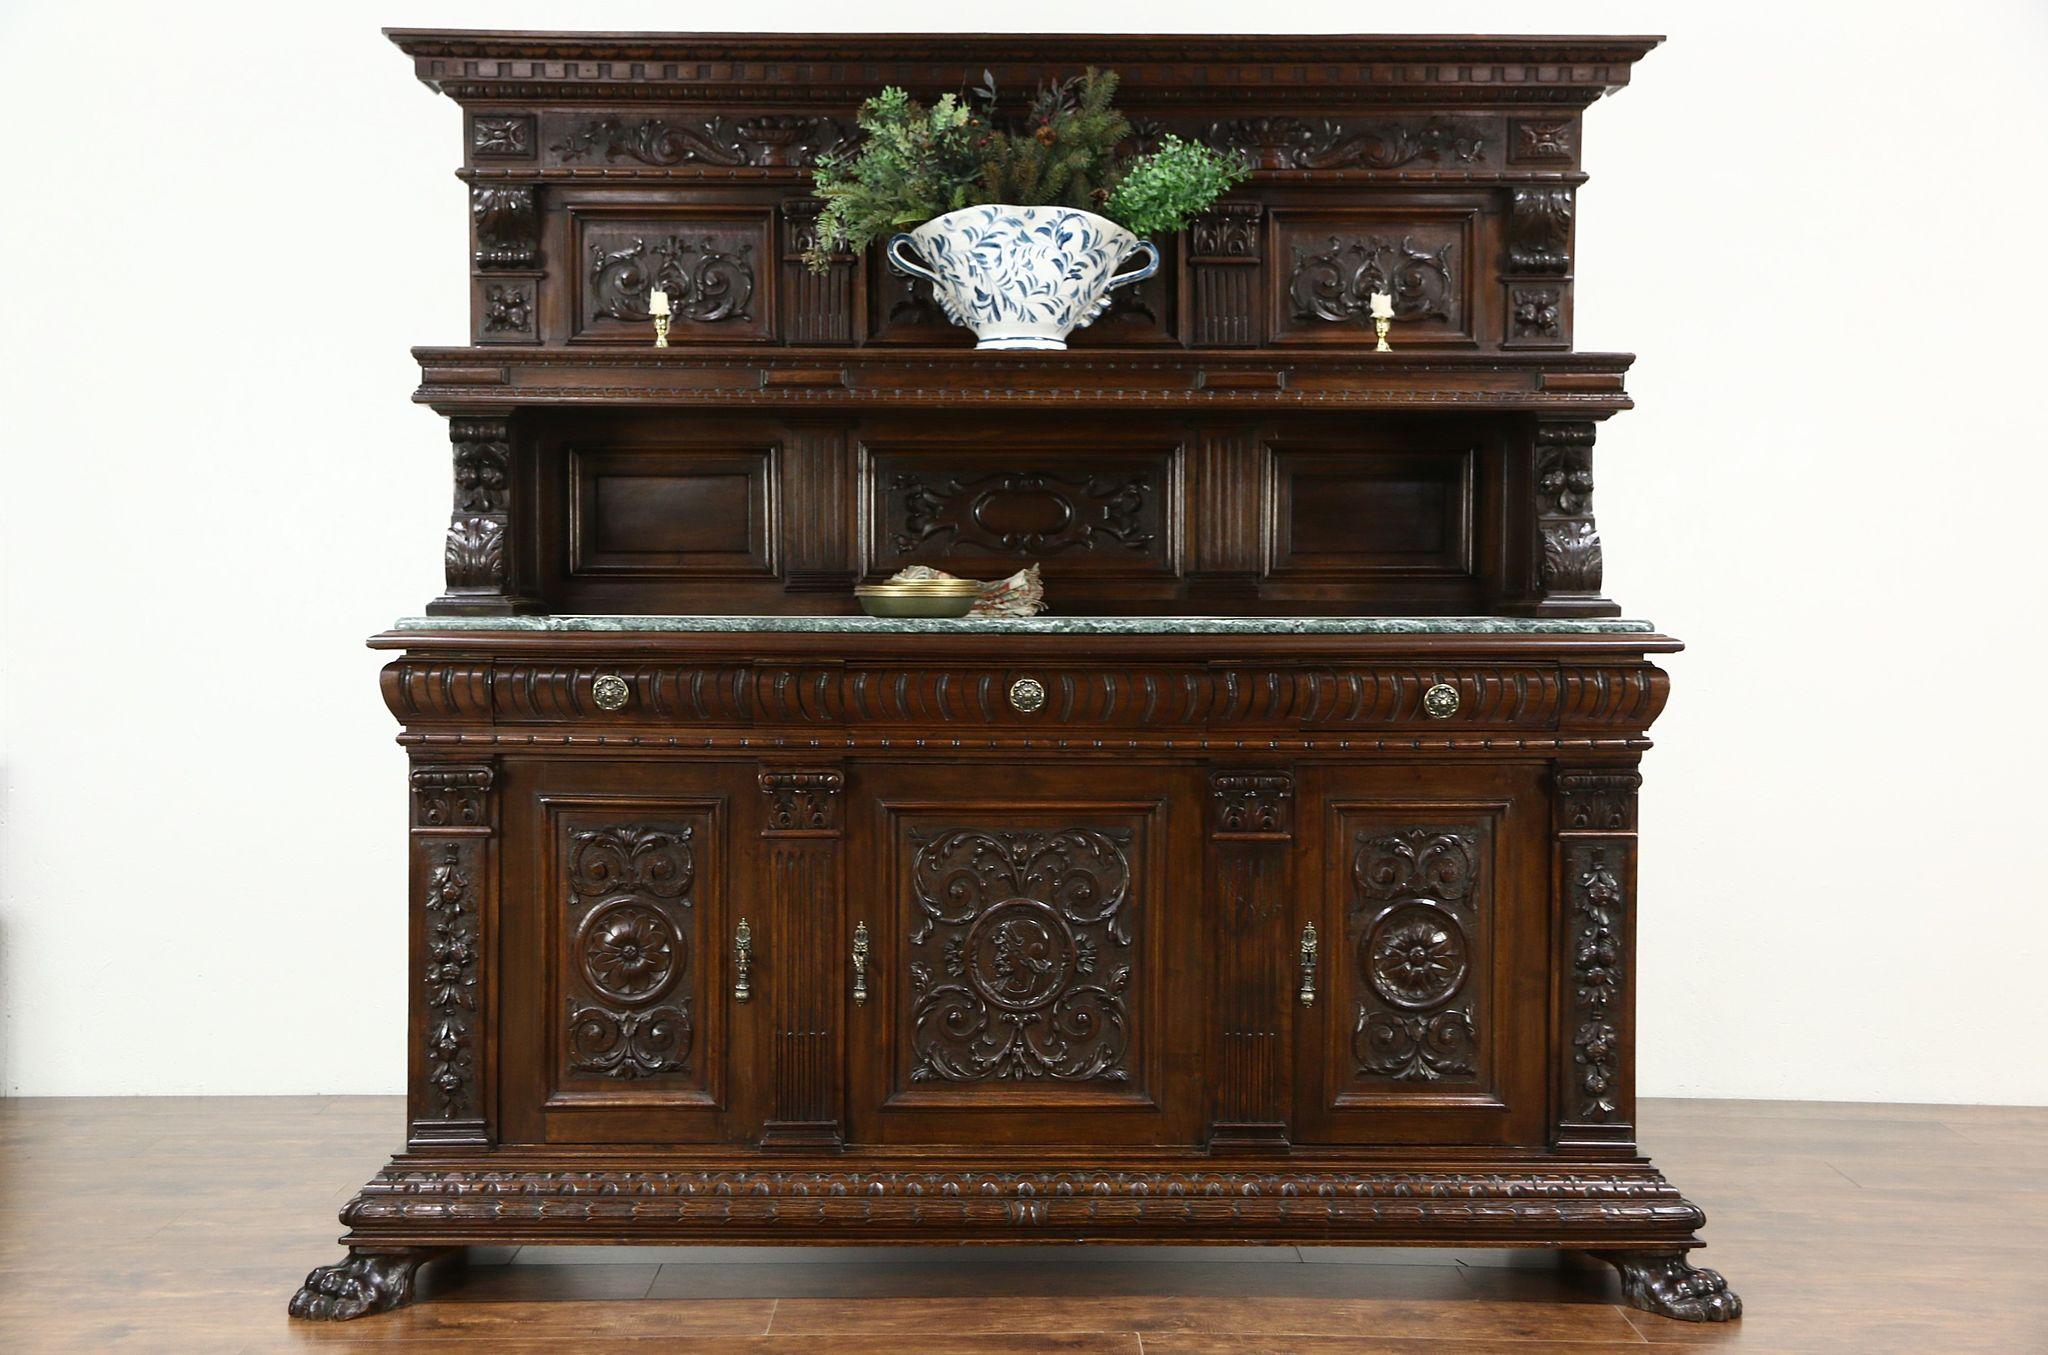 Italian Renaissance 1900 Antique Back Bar, Server or Sideboard, Marble Top